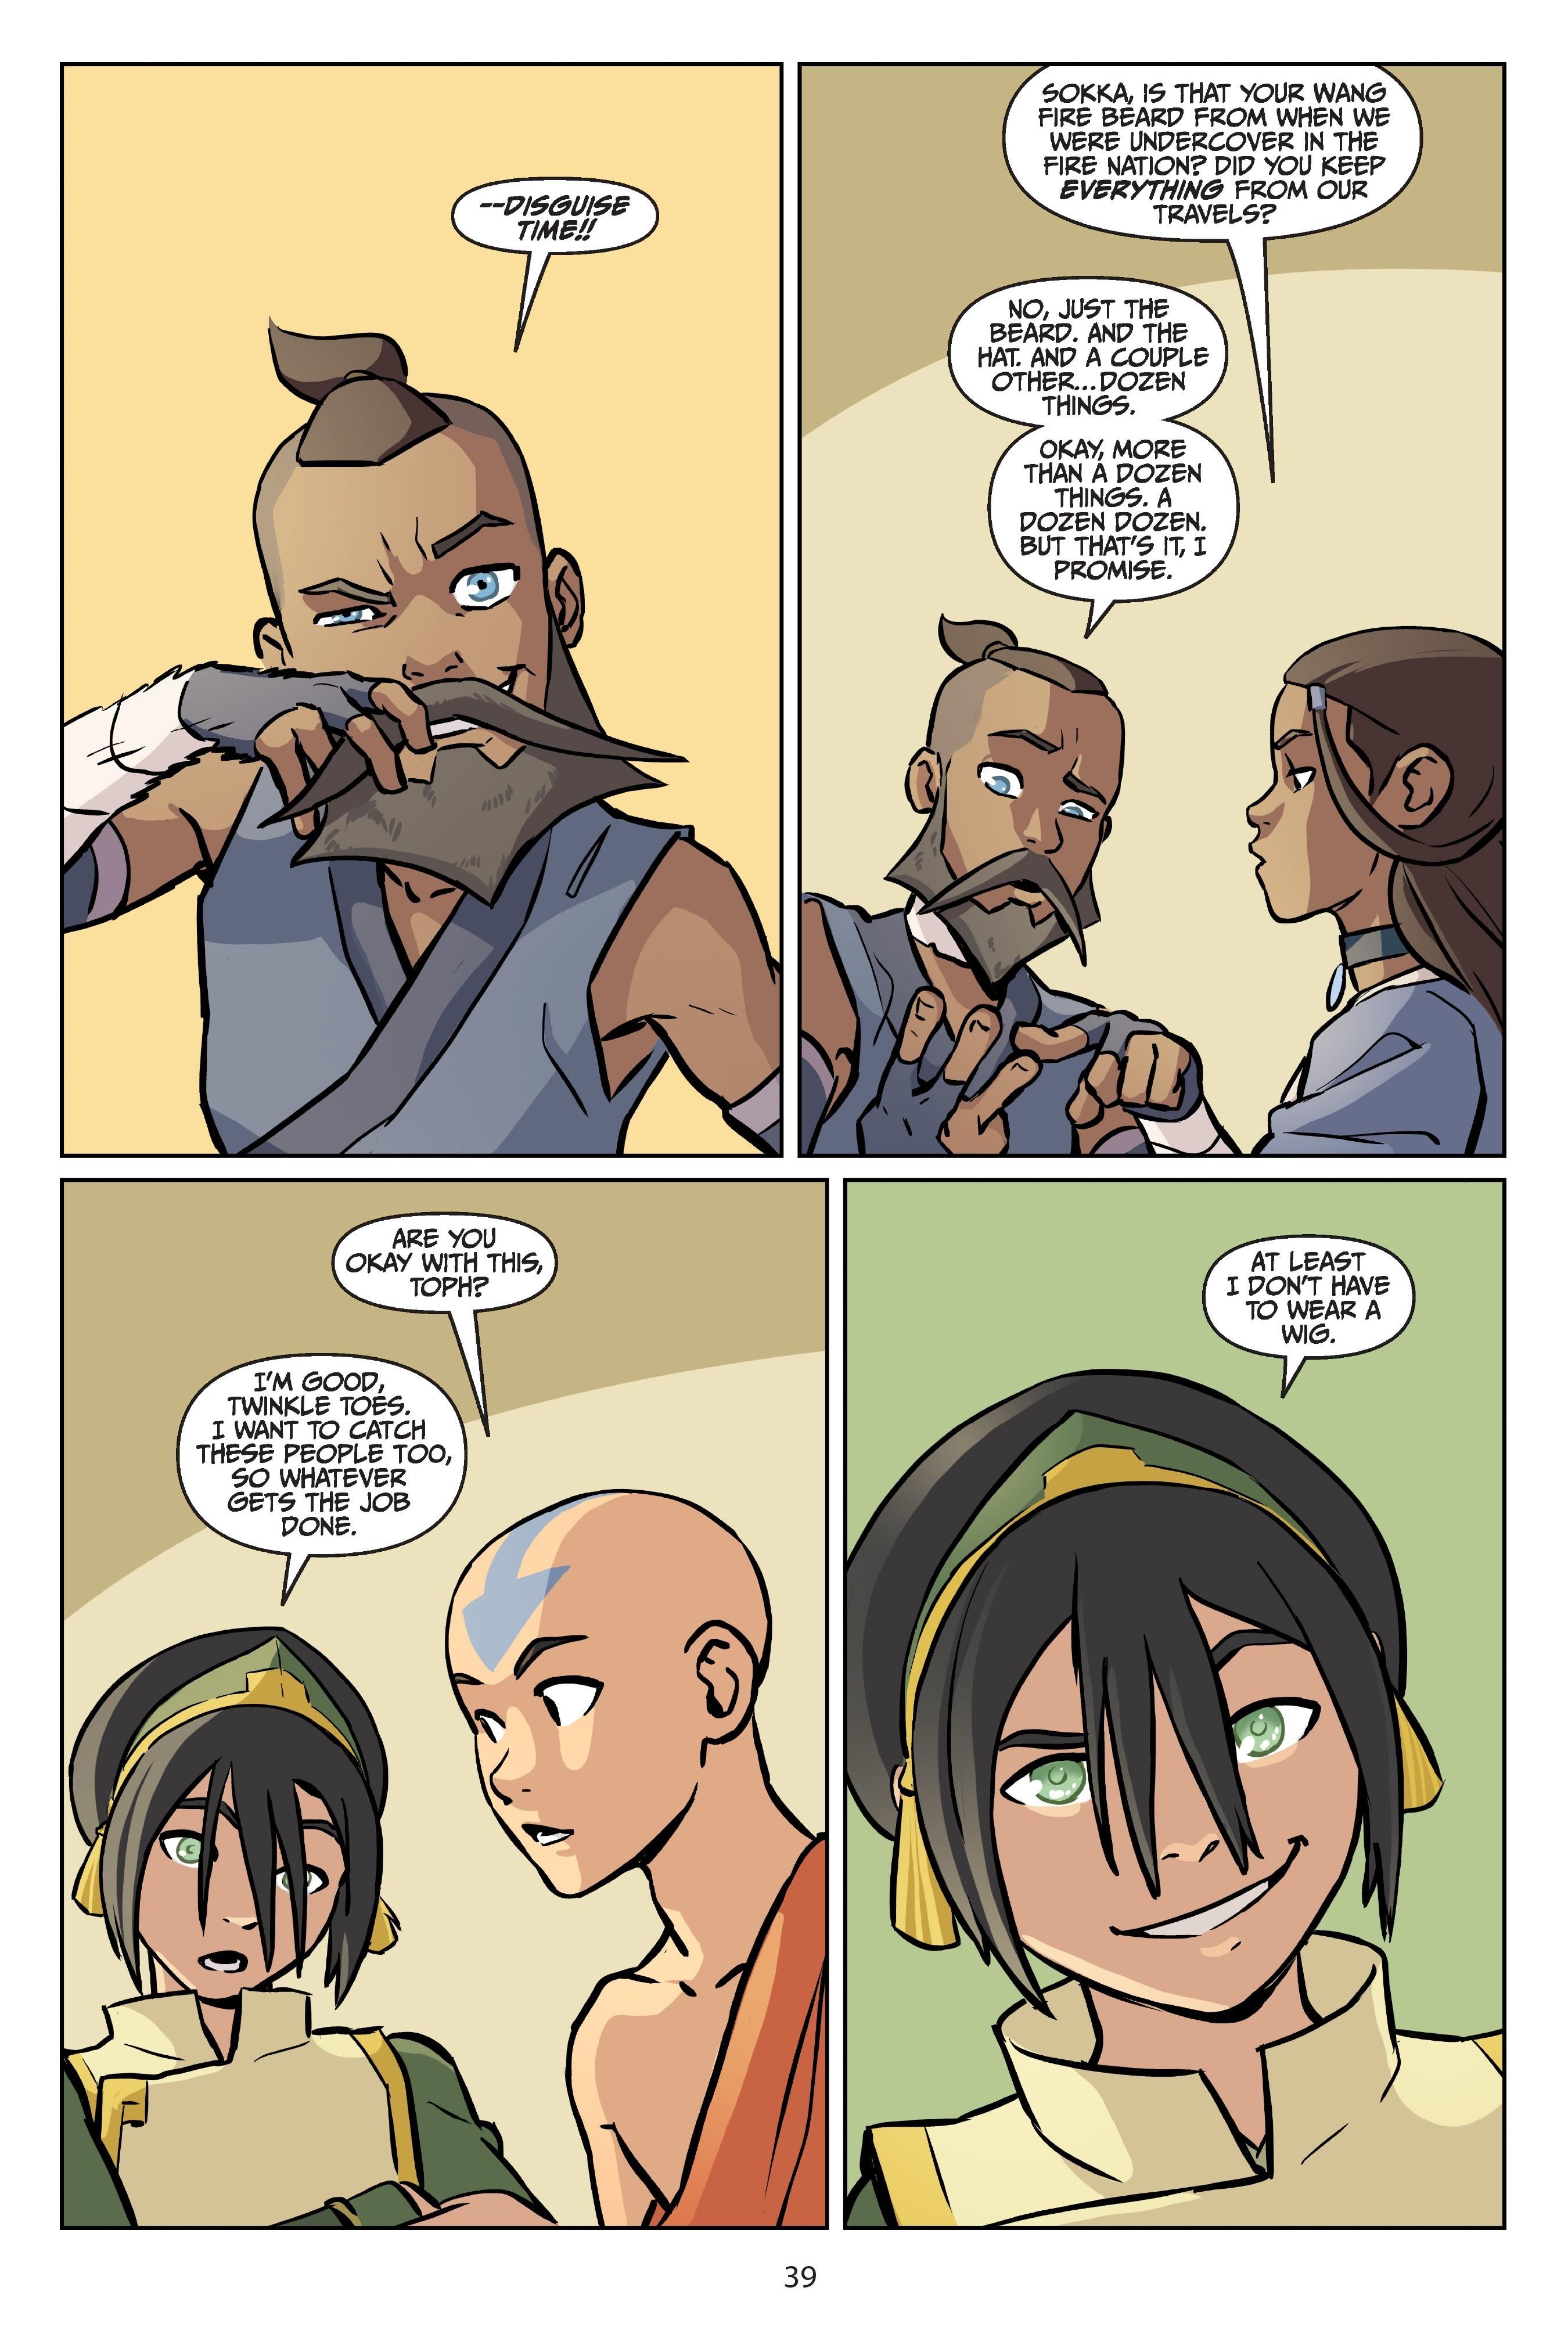 Nickelodeon Avatar: The Last Airbender - Imbalance TPB_2 Page 39